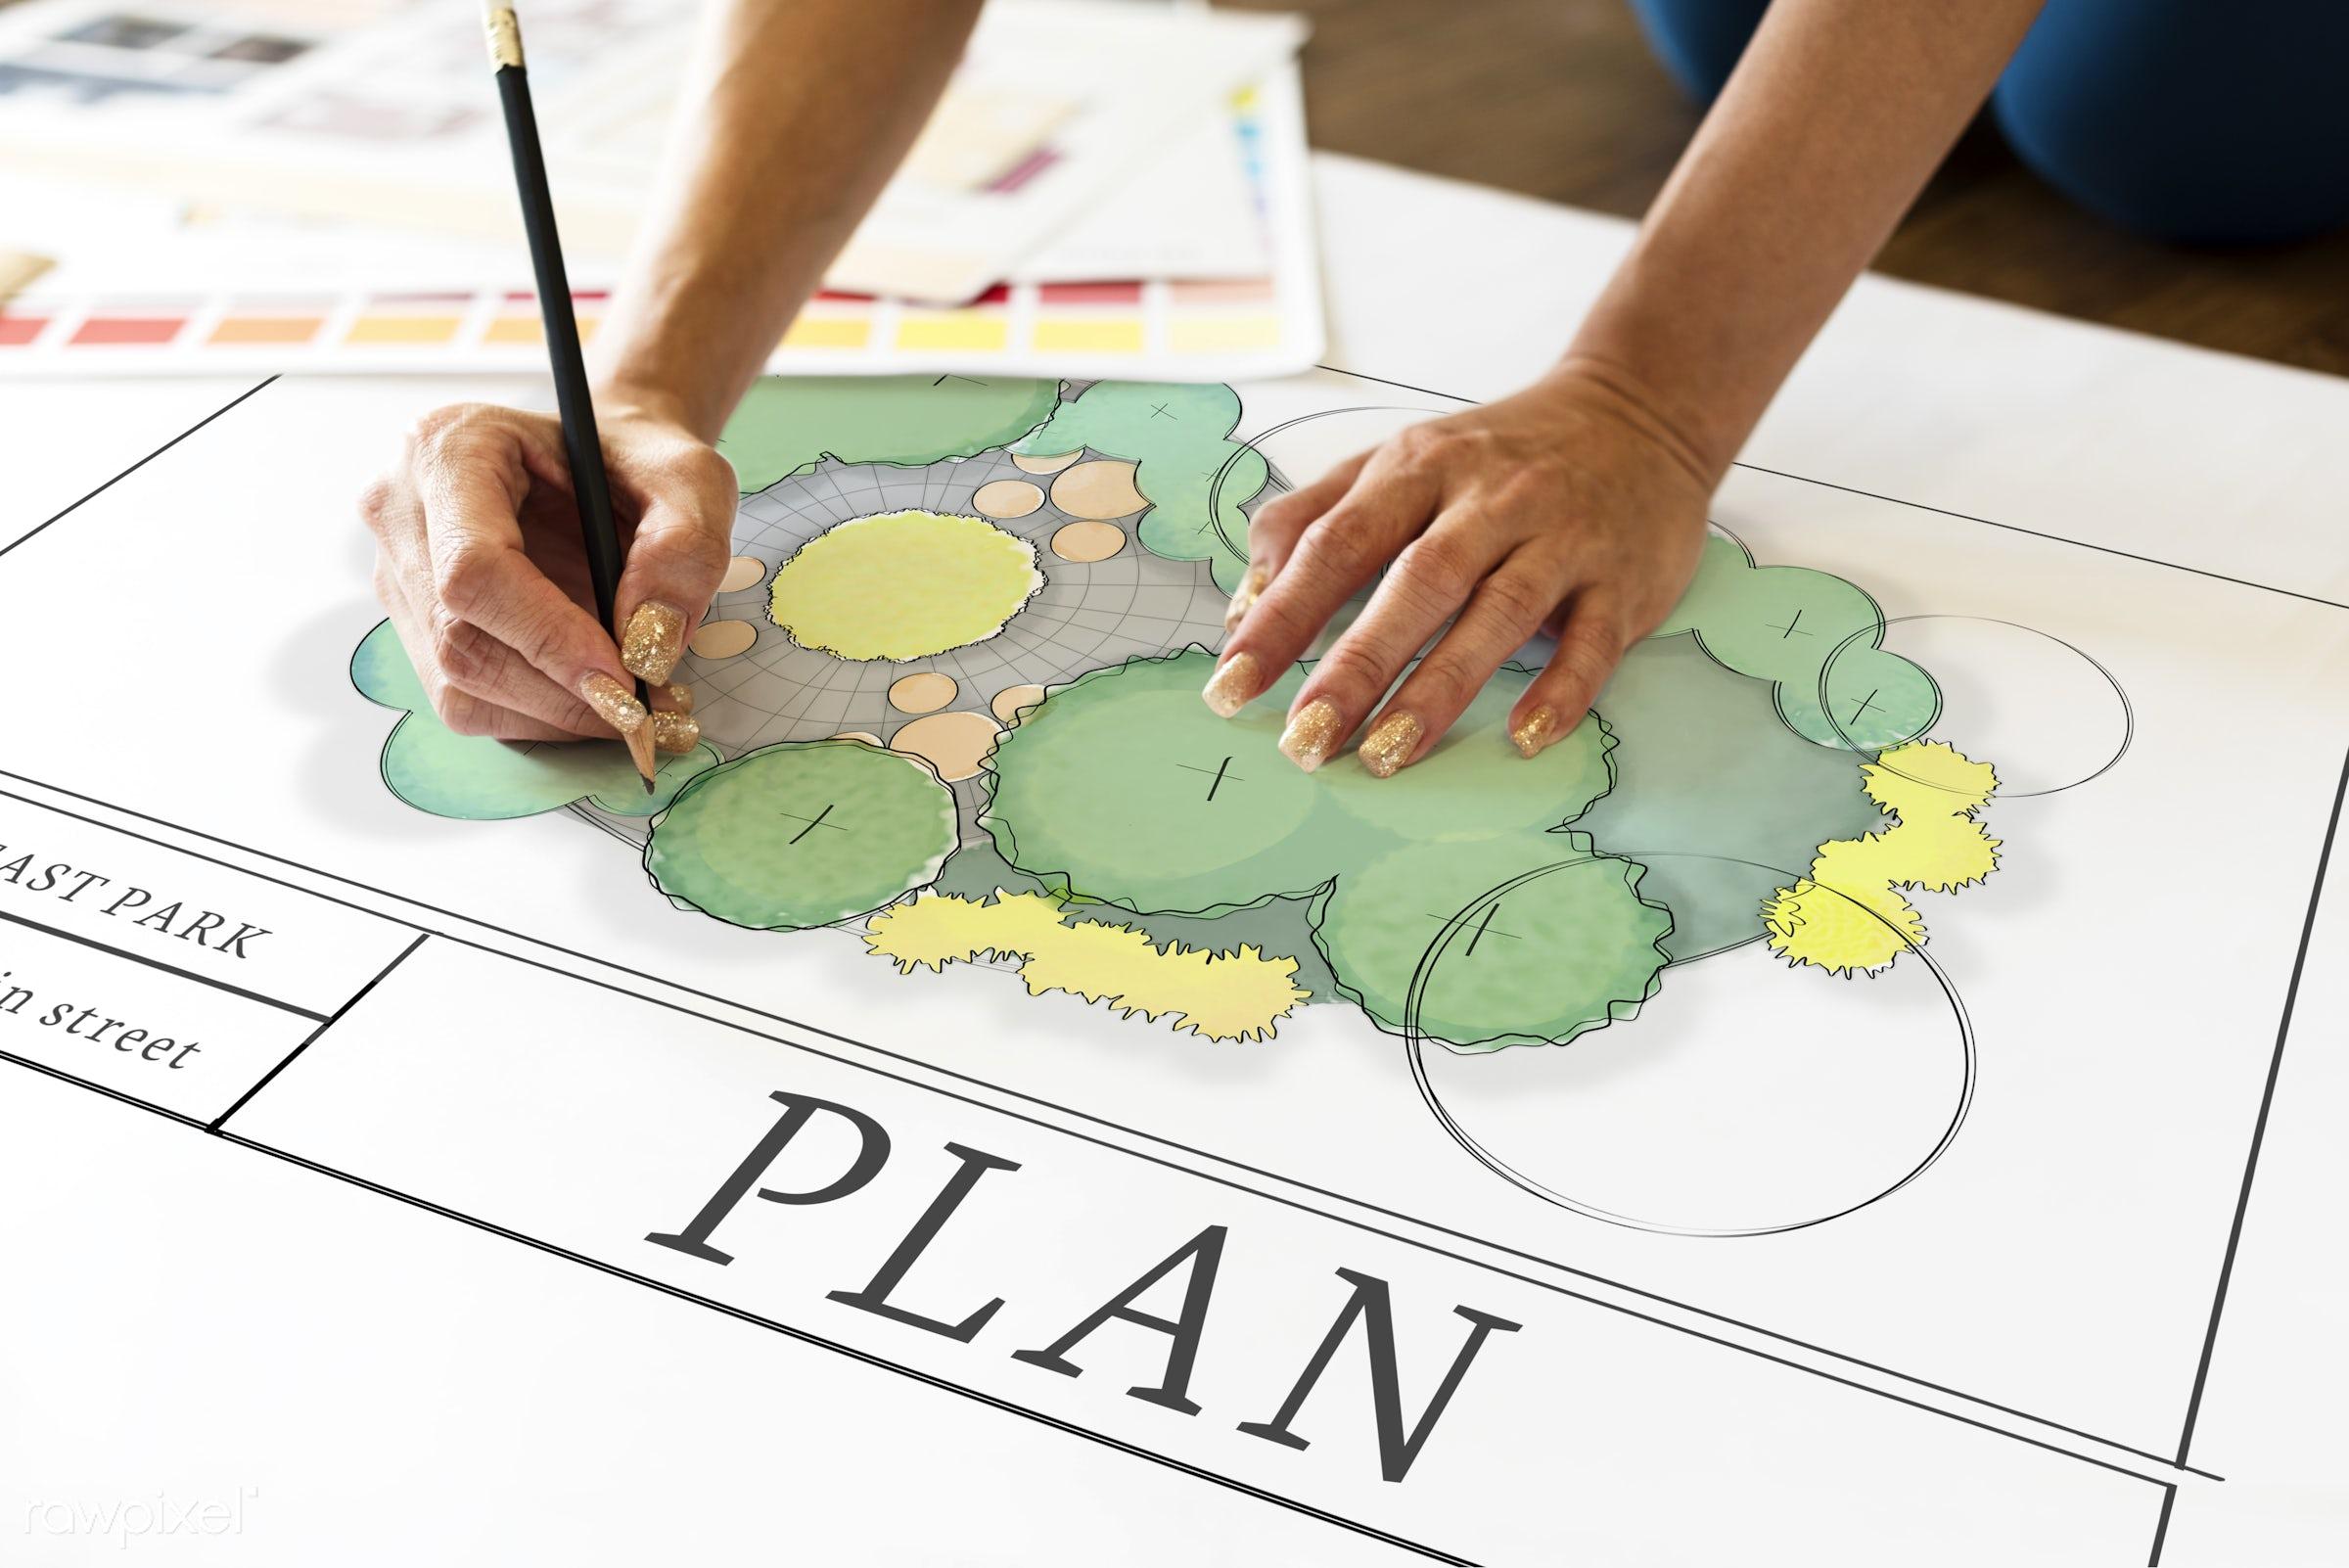 Design plan - map, architecture, art, concept, control, creation, creative, creativity, data, design, diagram, digital,...